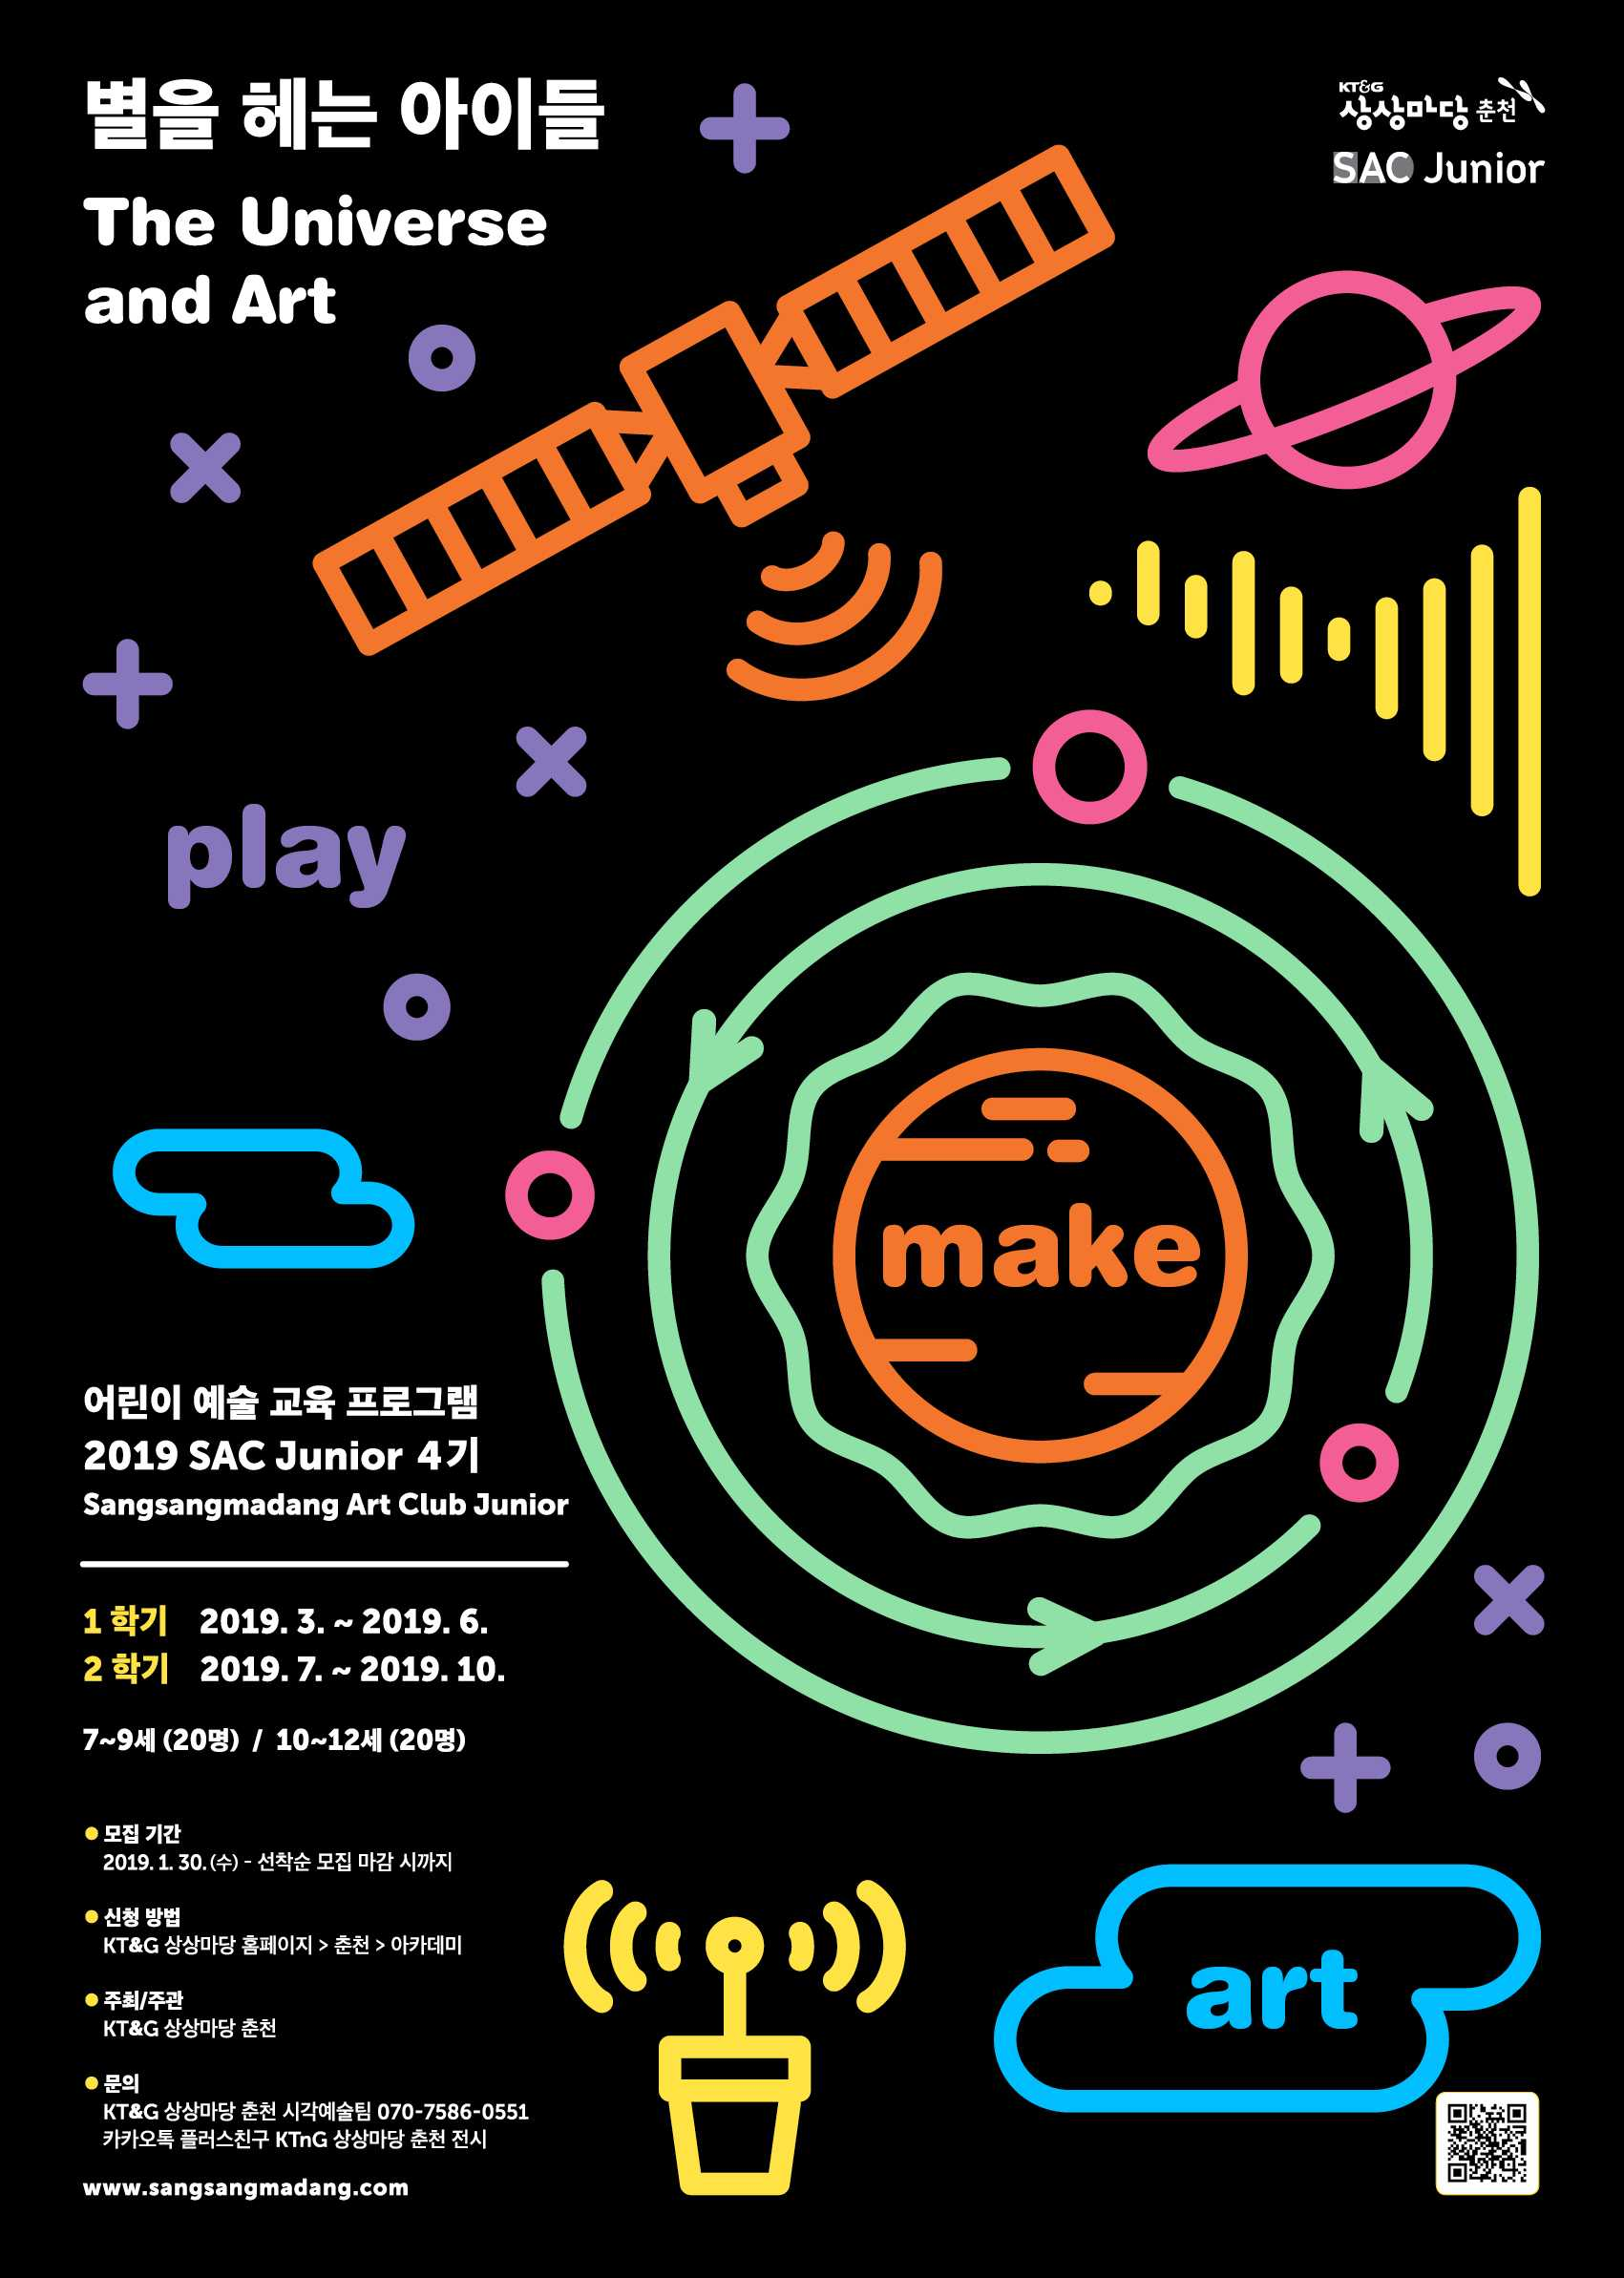 2019 <SAC Junior> 4기_1학기 (7-9세)